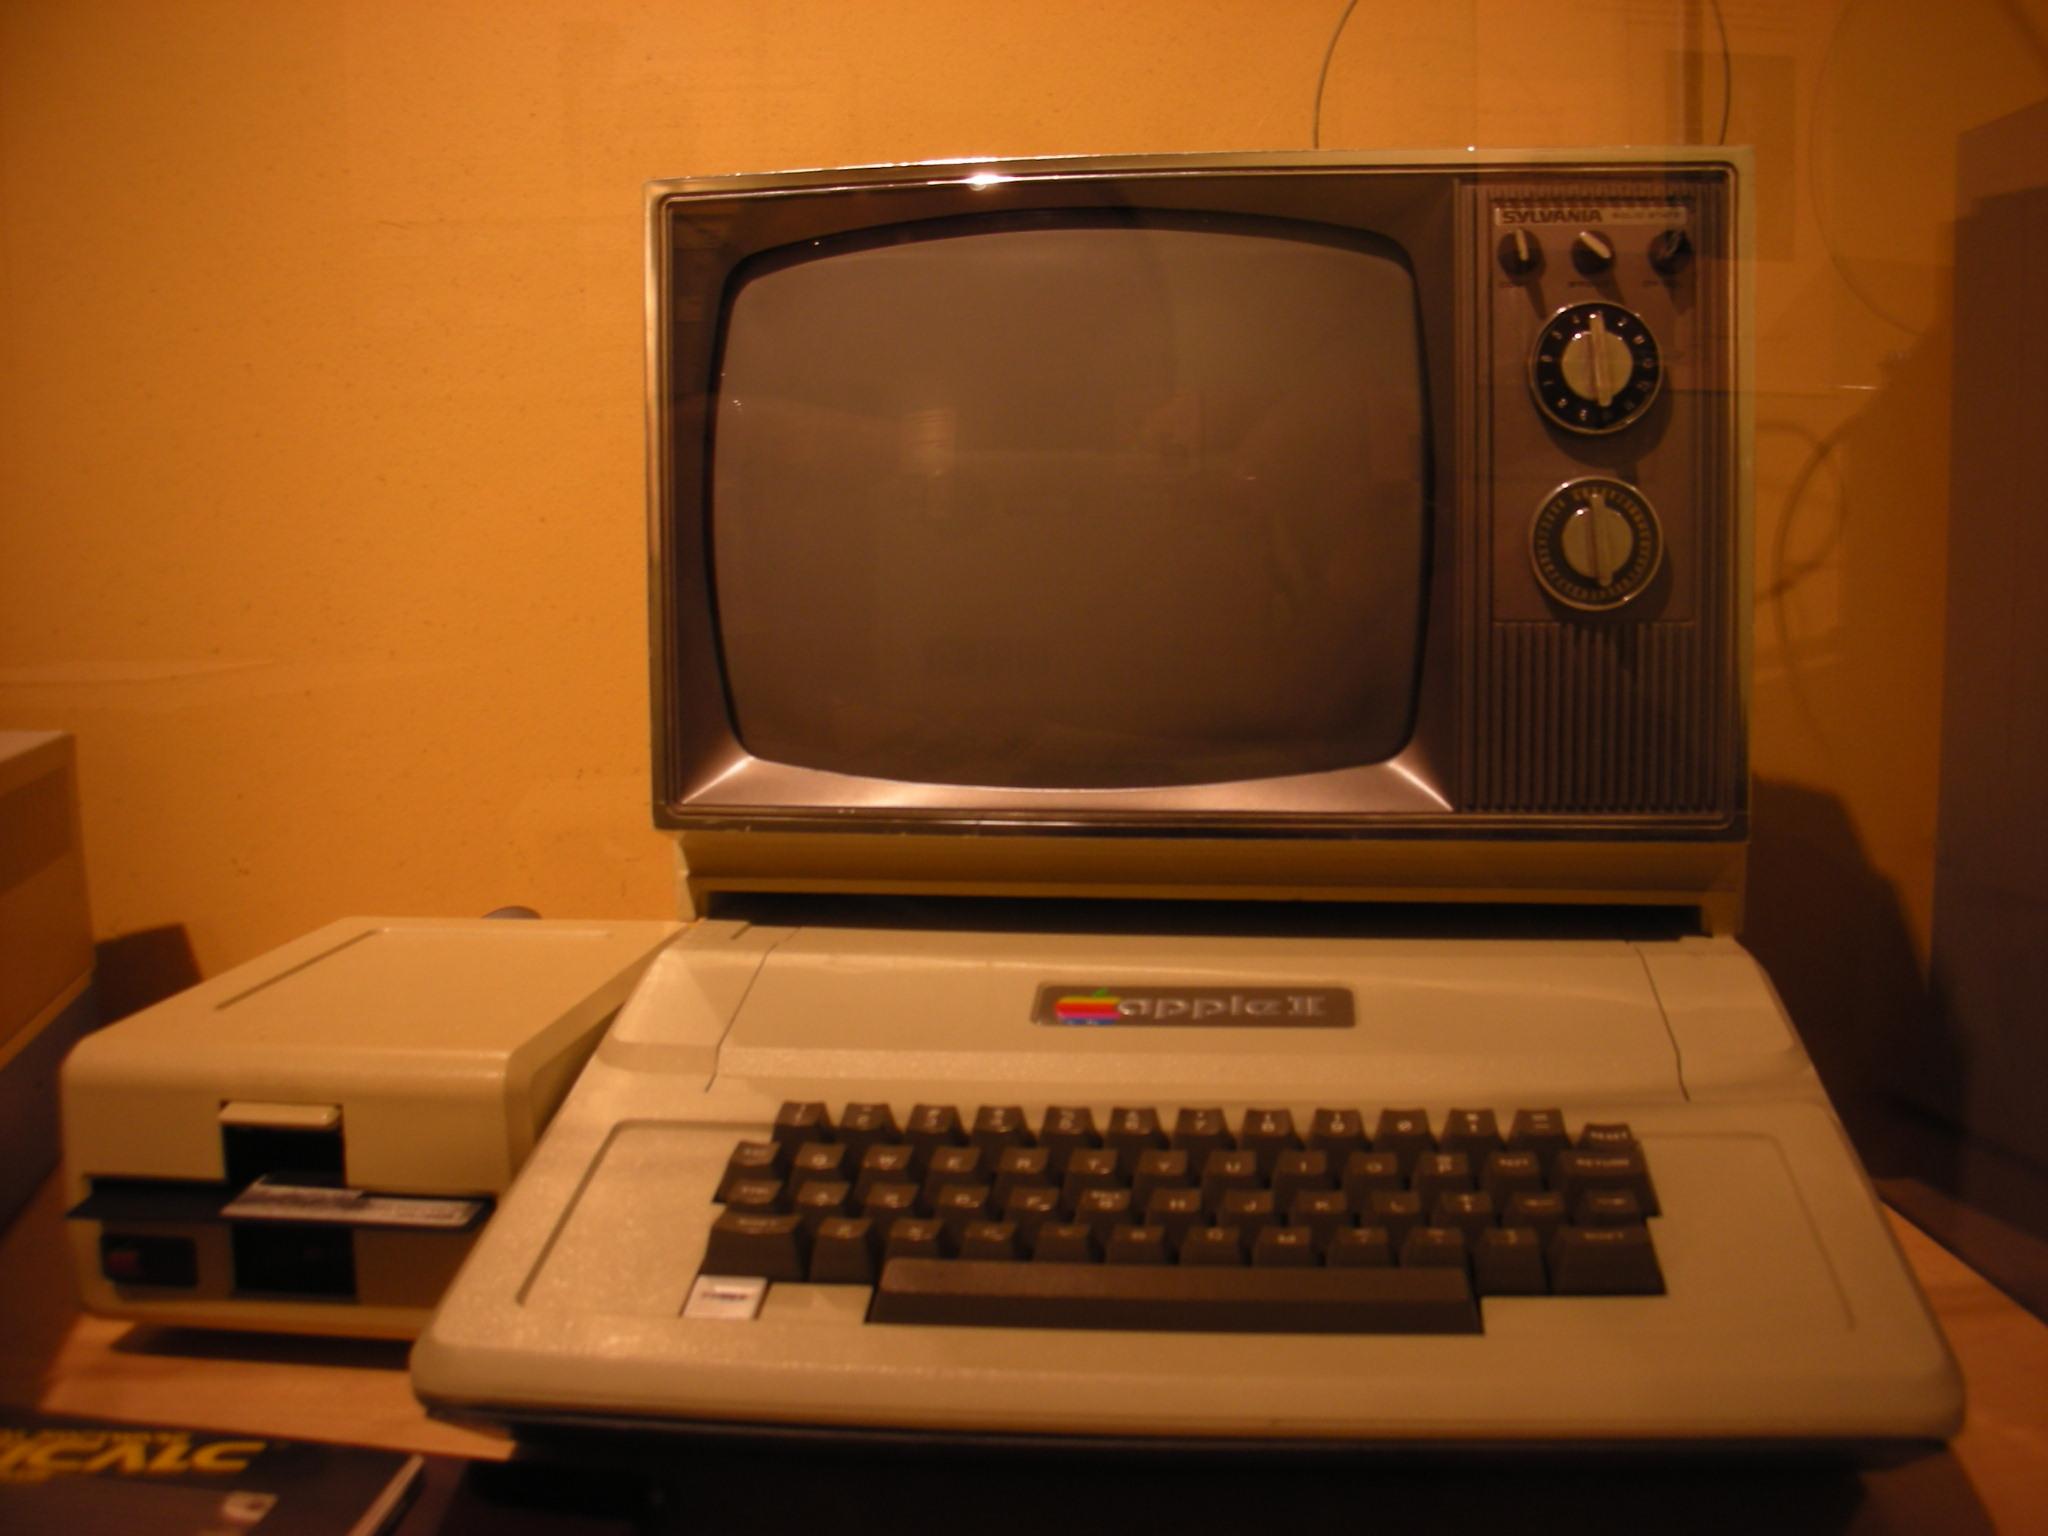 Apple II, introduced 1977